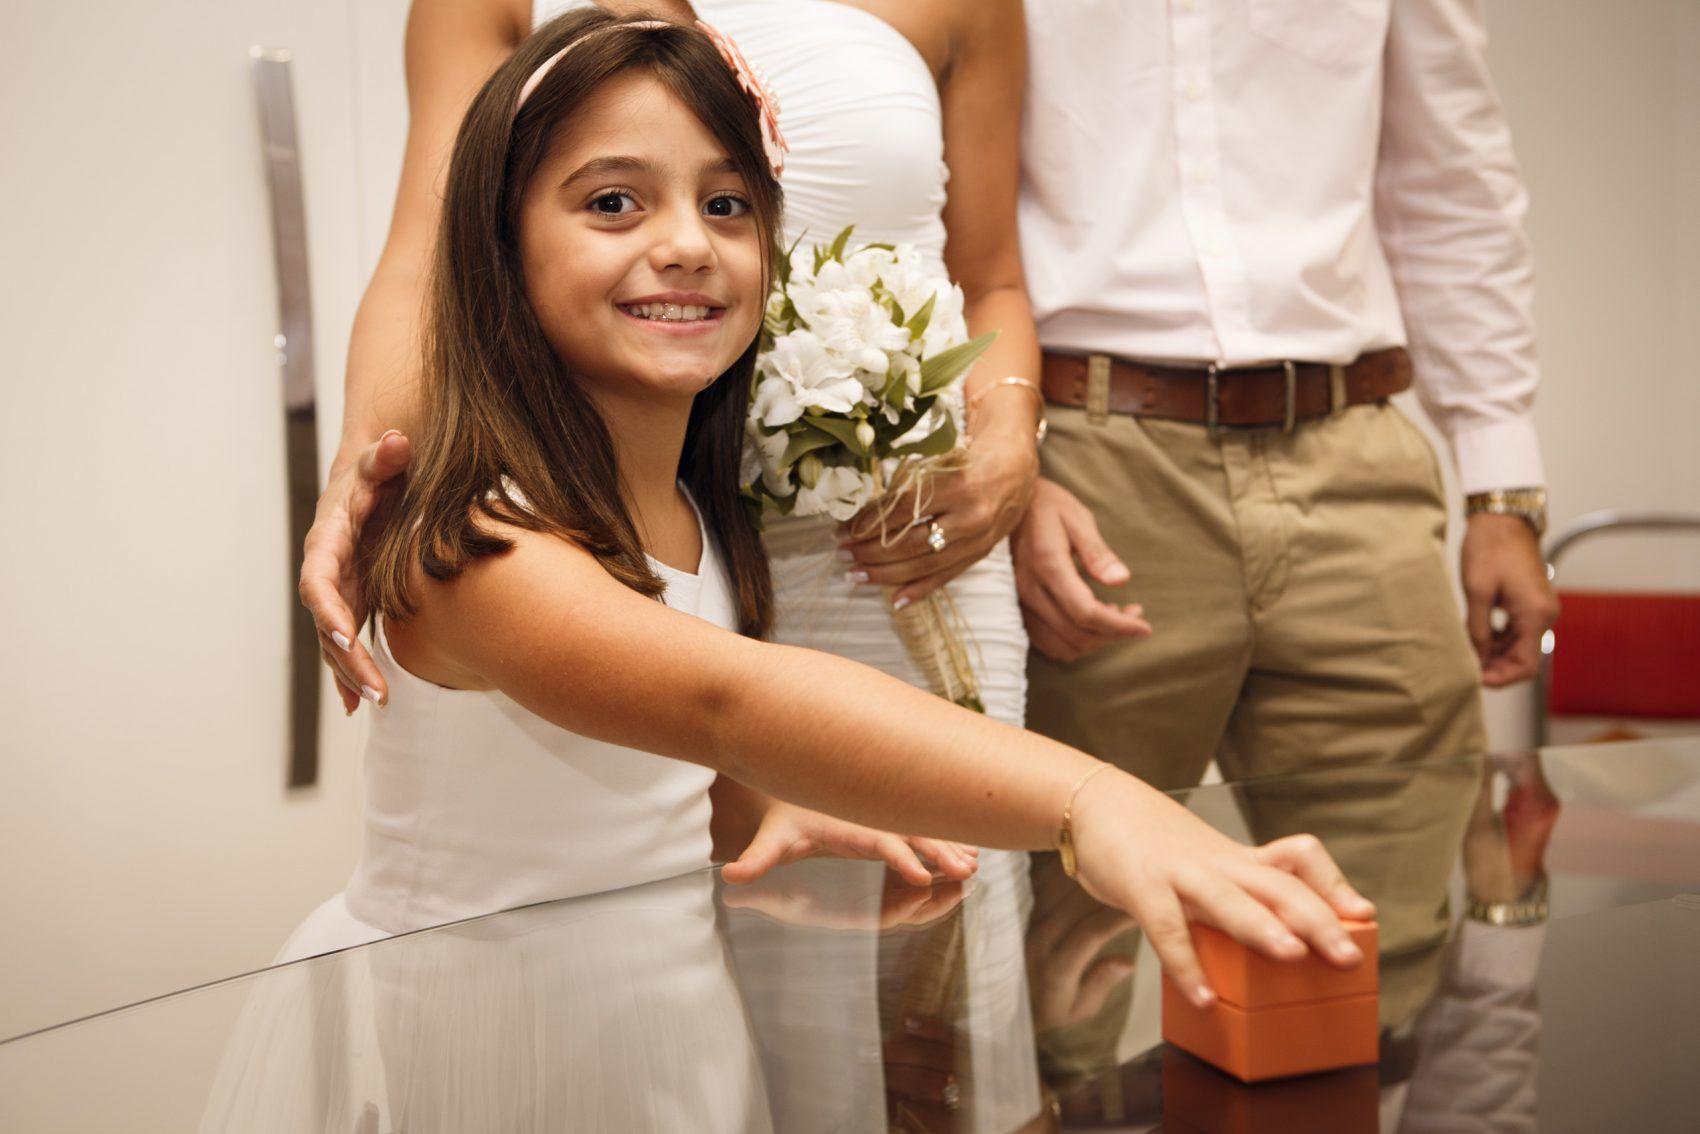 casamento civil curitiba - nadalin fotografia